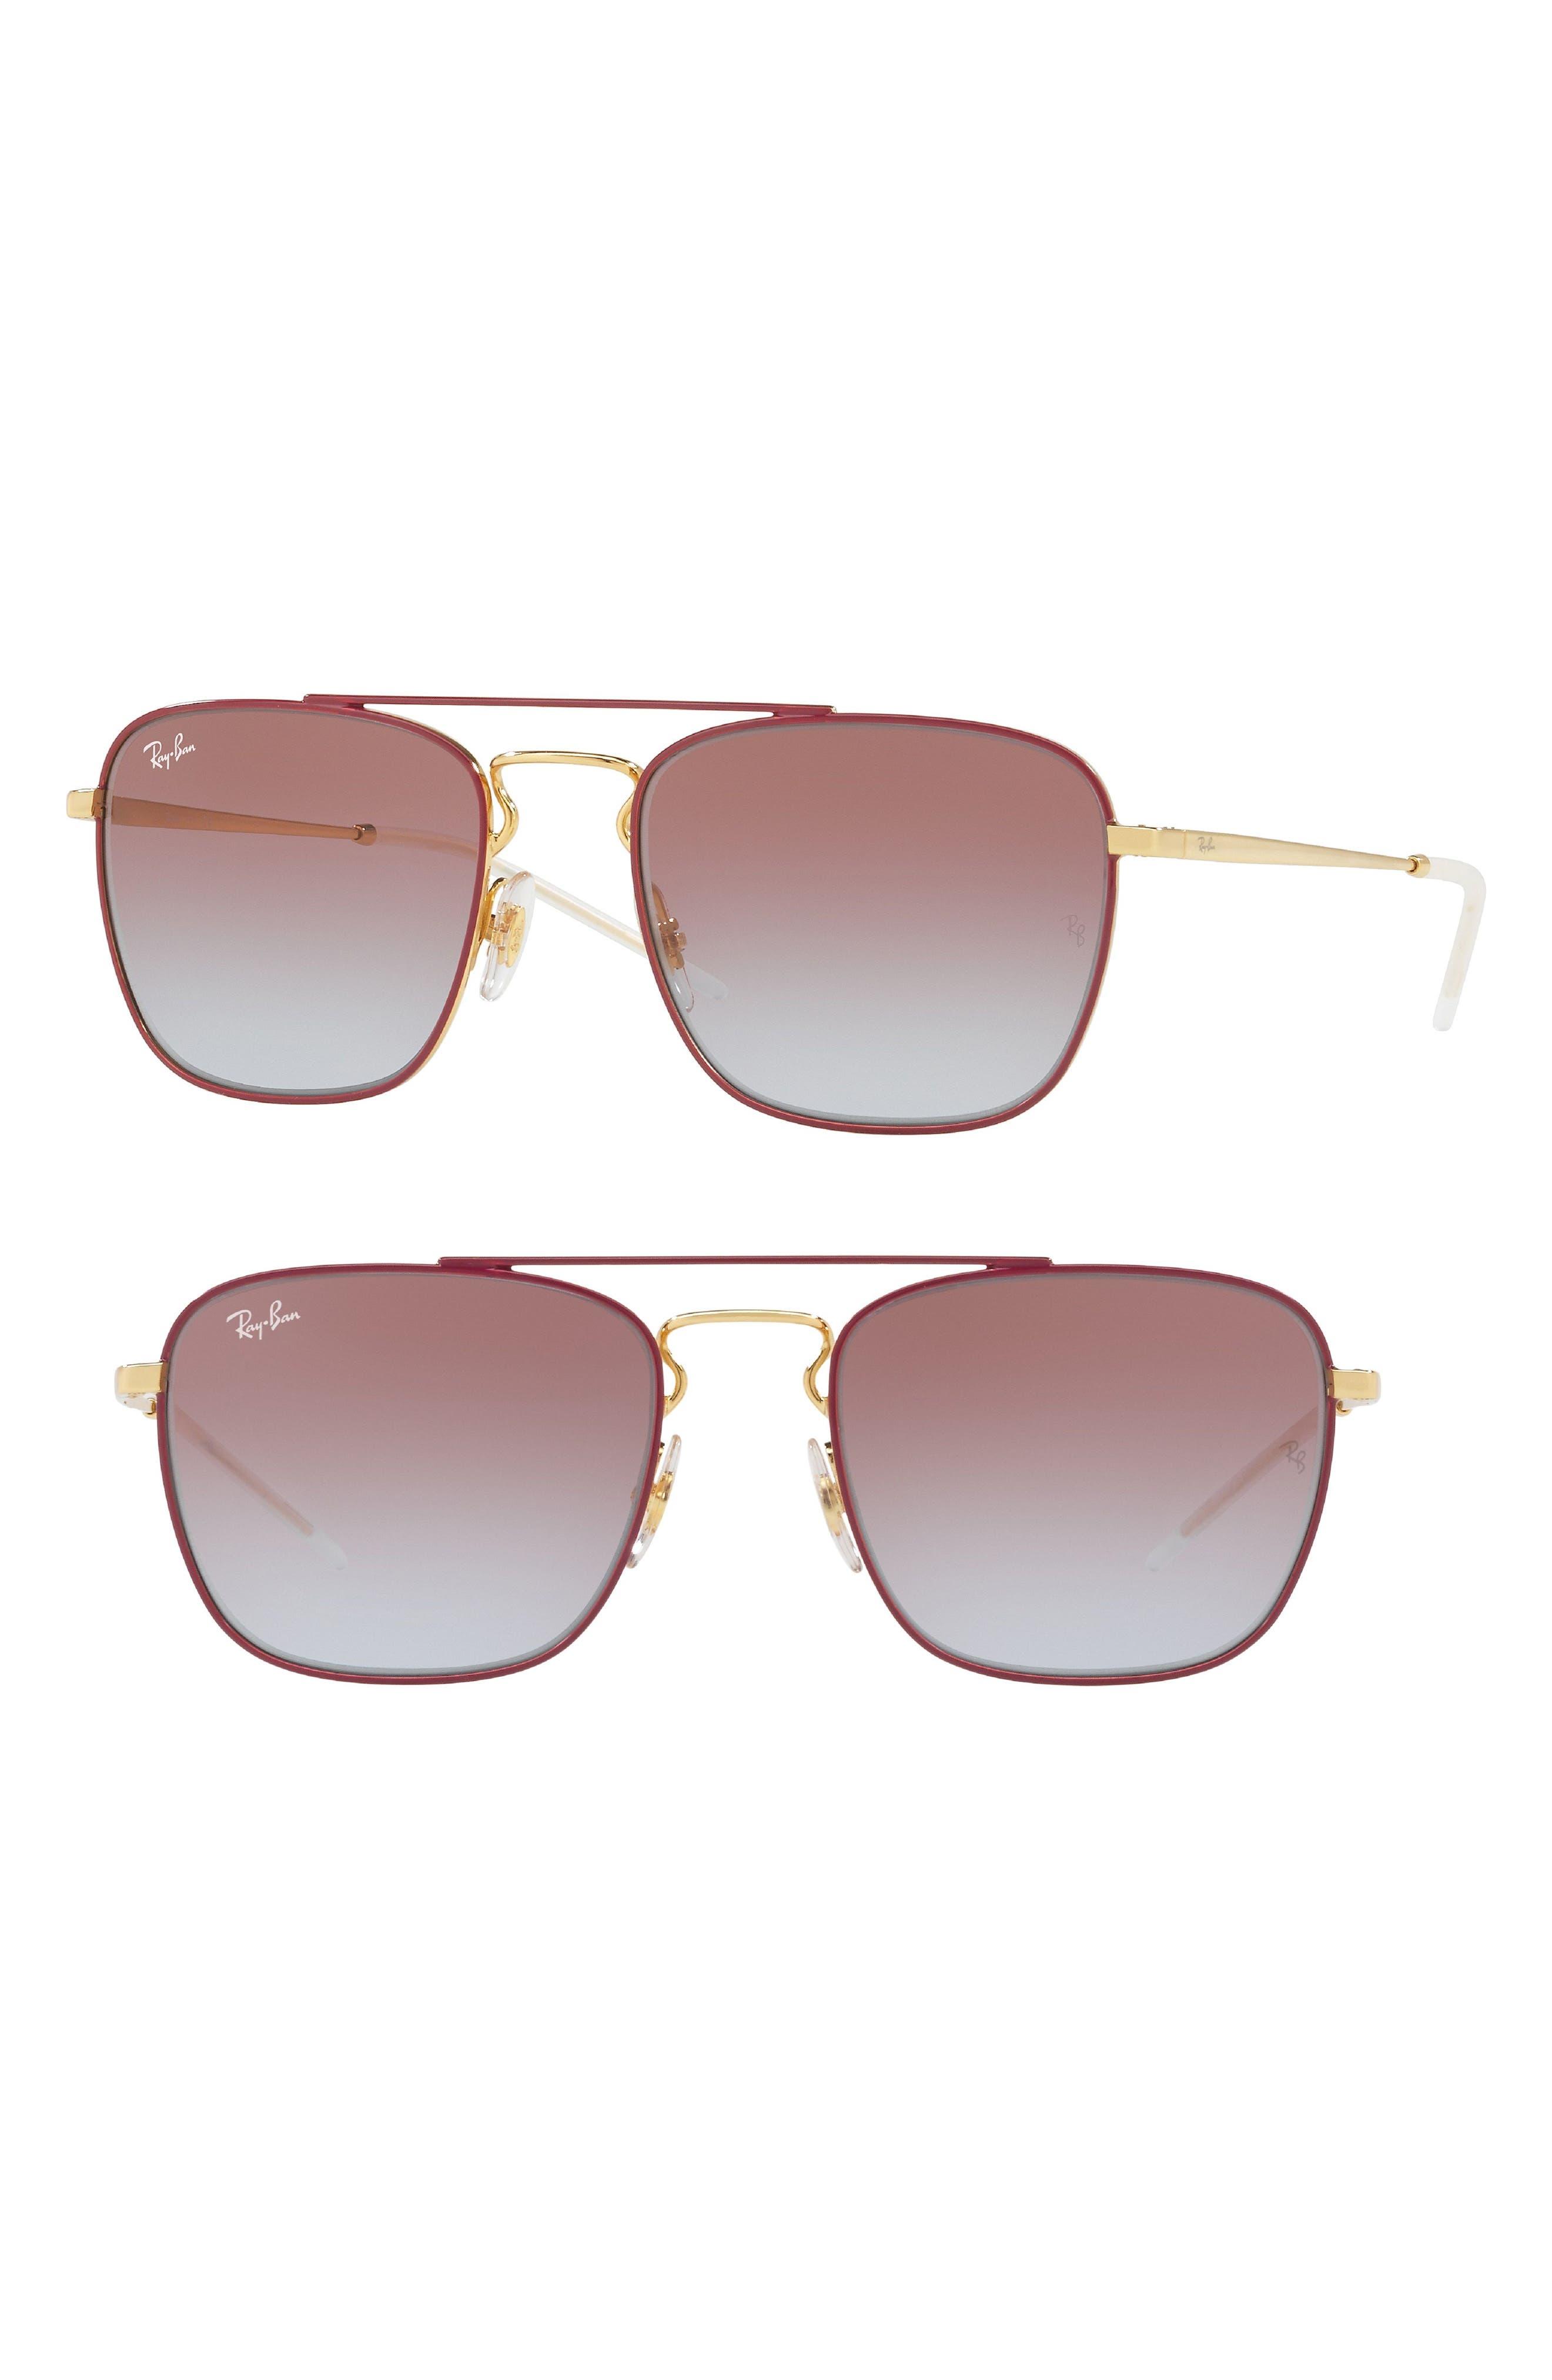 55mm Metal Aviator Sunglasses,                             Main thumbnail 1, color,                             Bordeaux